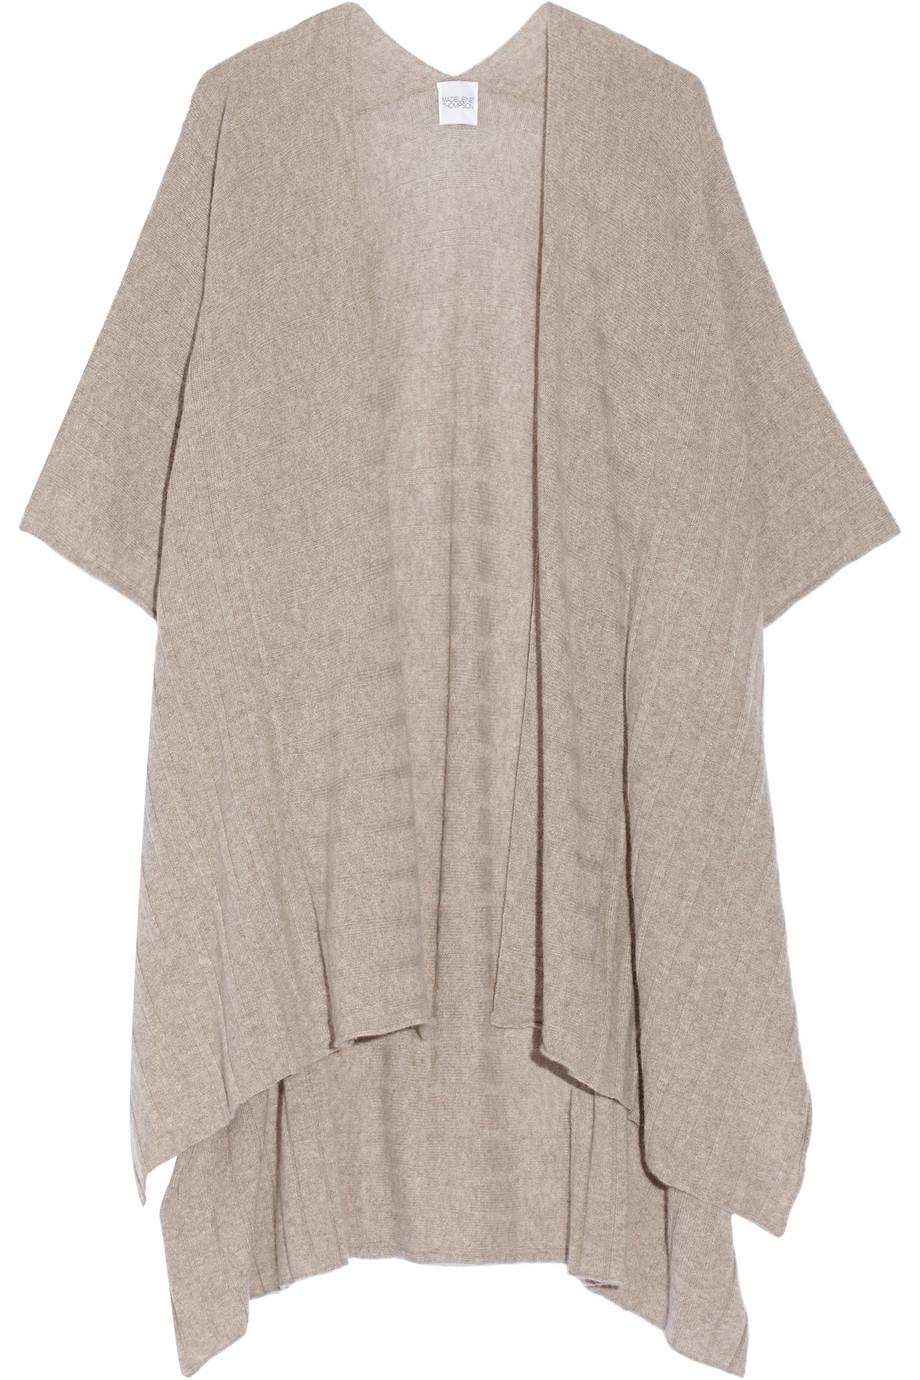 Ribbed-Knit Cashmere Wrap, Madeleine Thompson, Mushroom, Women's